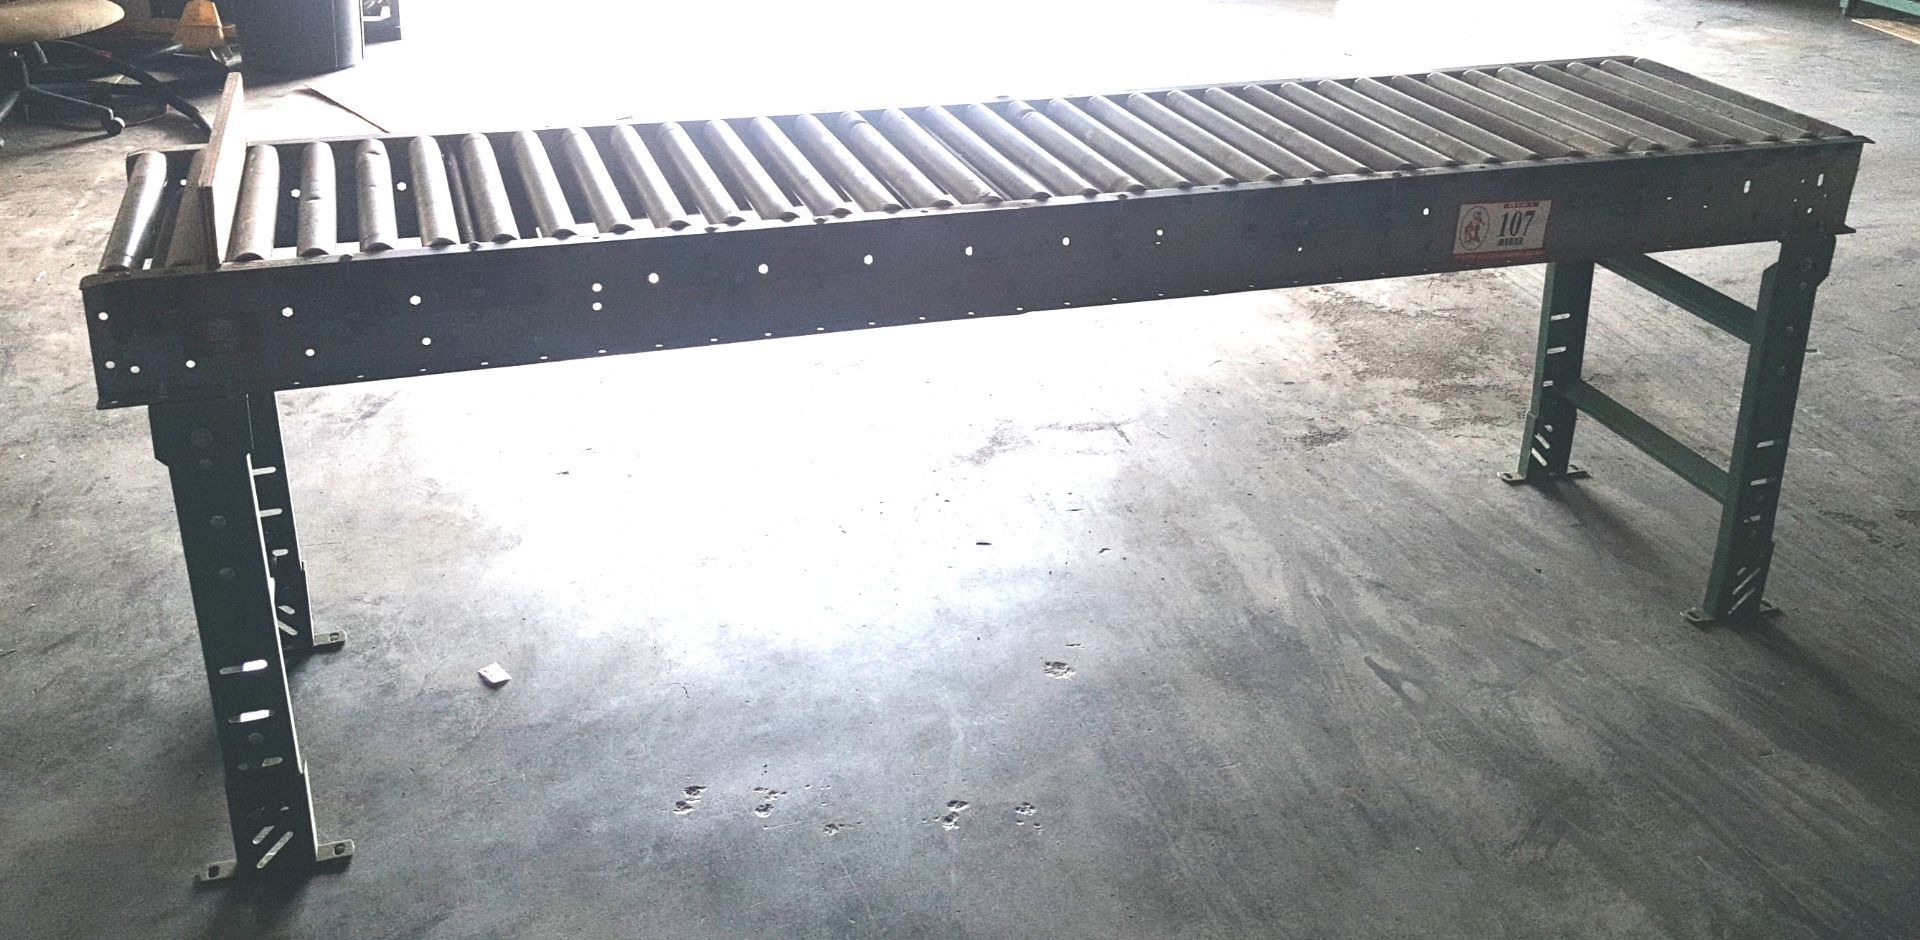 Hytrol Gravity Conveyor w/ 12ft Roller, Used, Adjustable legs and pressure tensioners., Includes 4